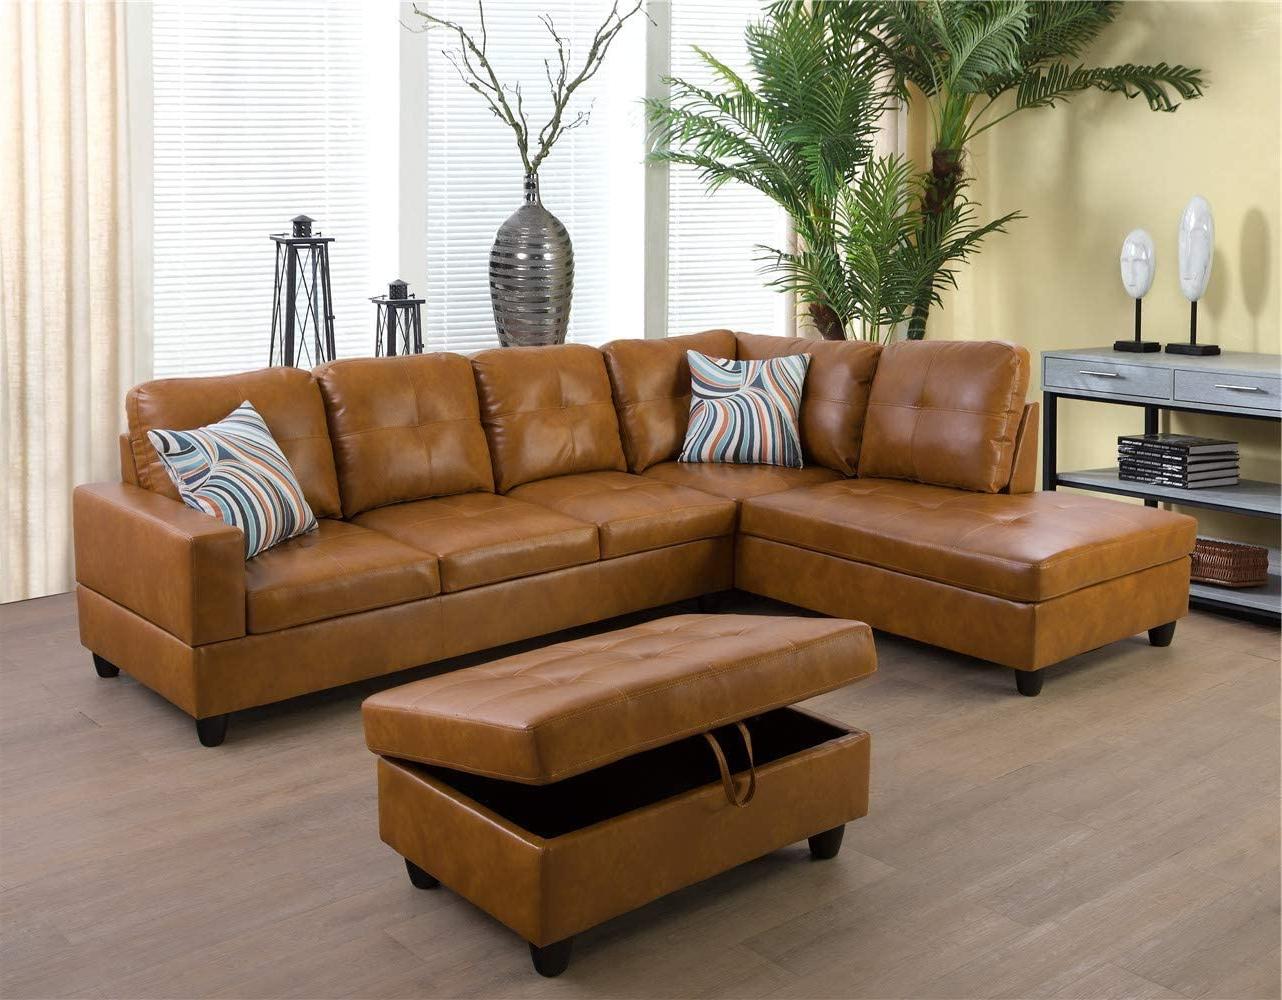 Trendy Ponliving Furniture Caramel  (View 2 of 20)